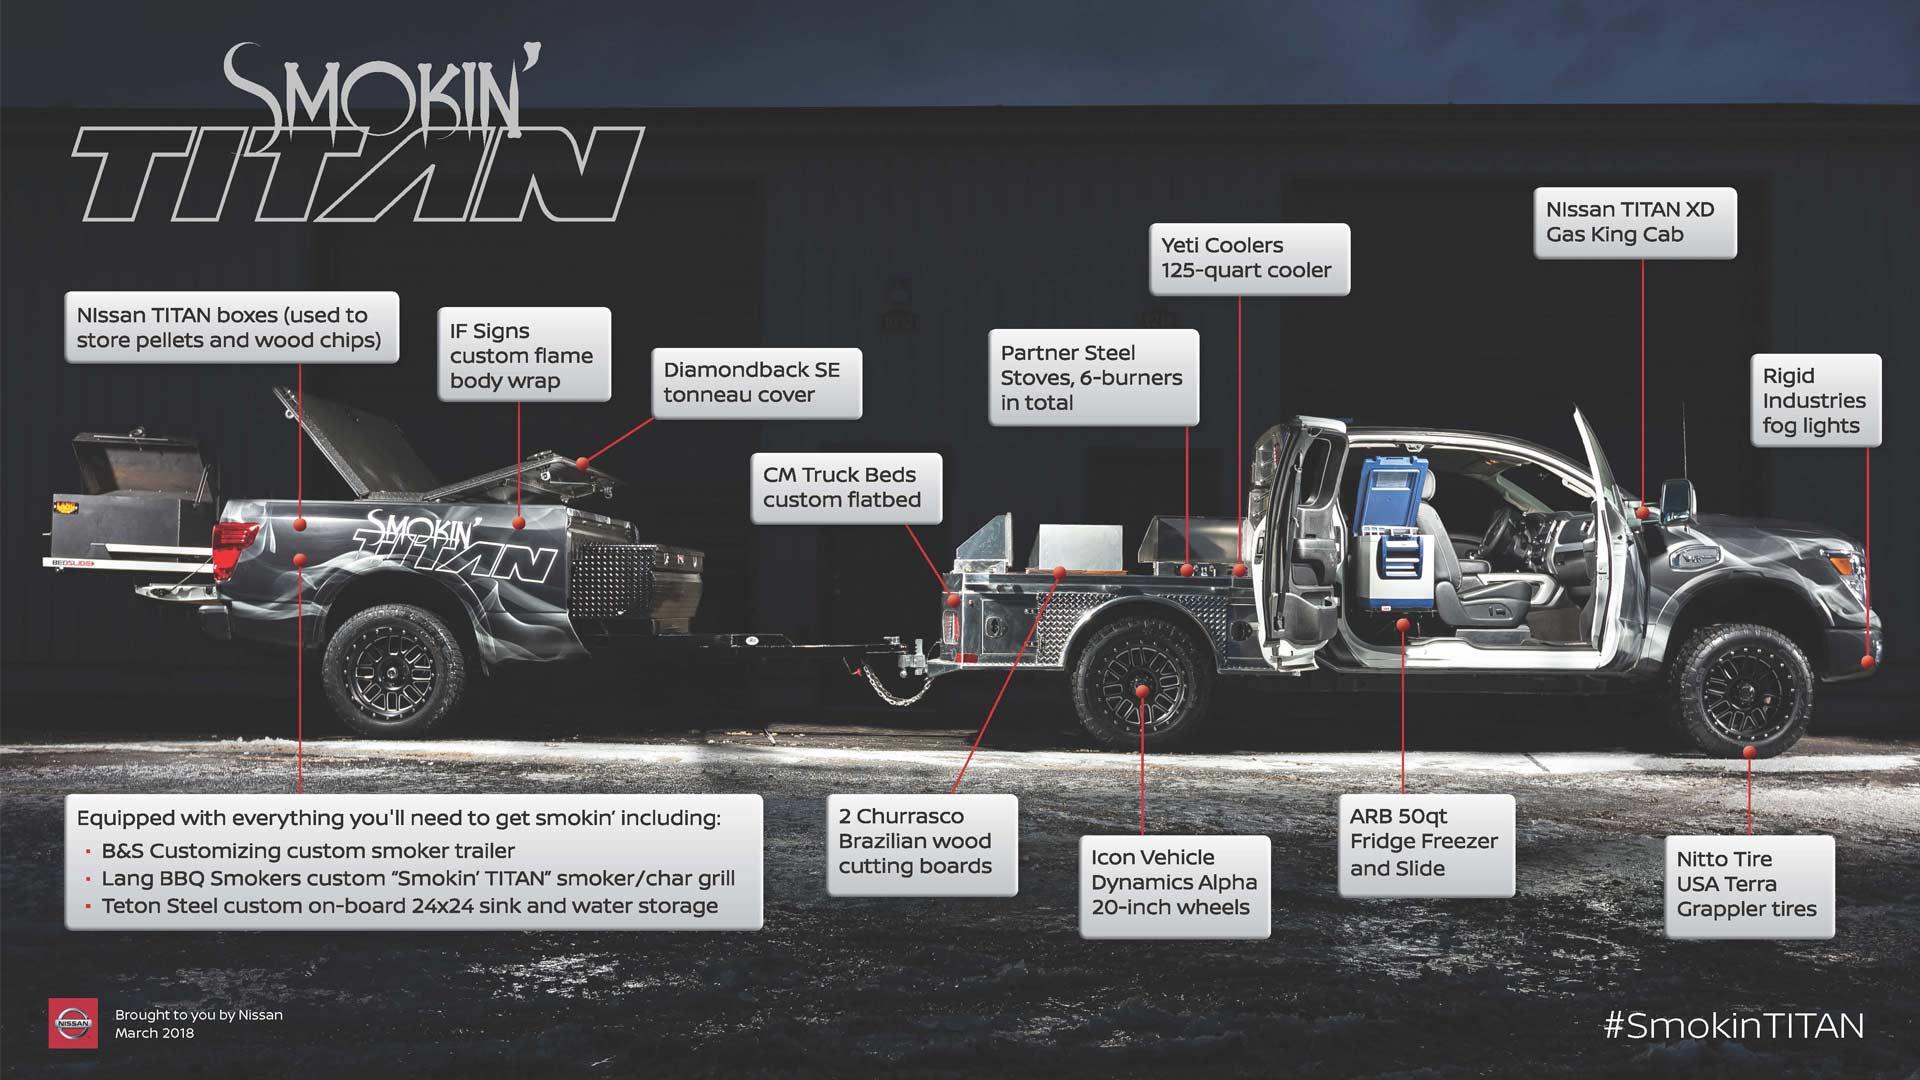 Nissan's-Smokin'-TITAN-BBQ_6